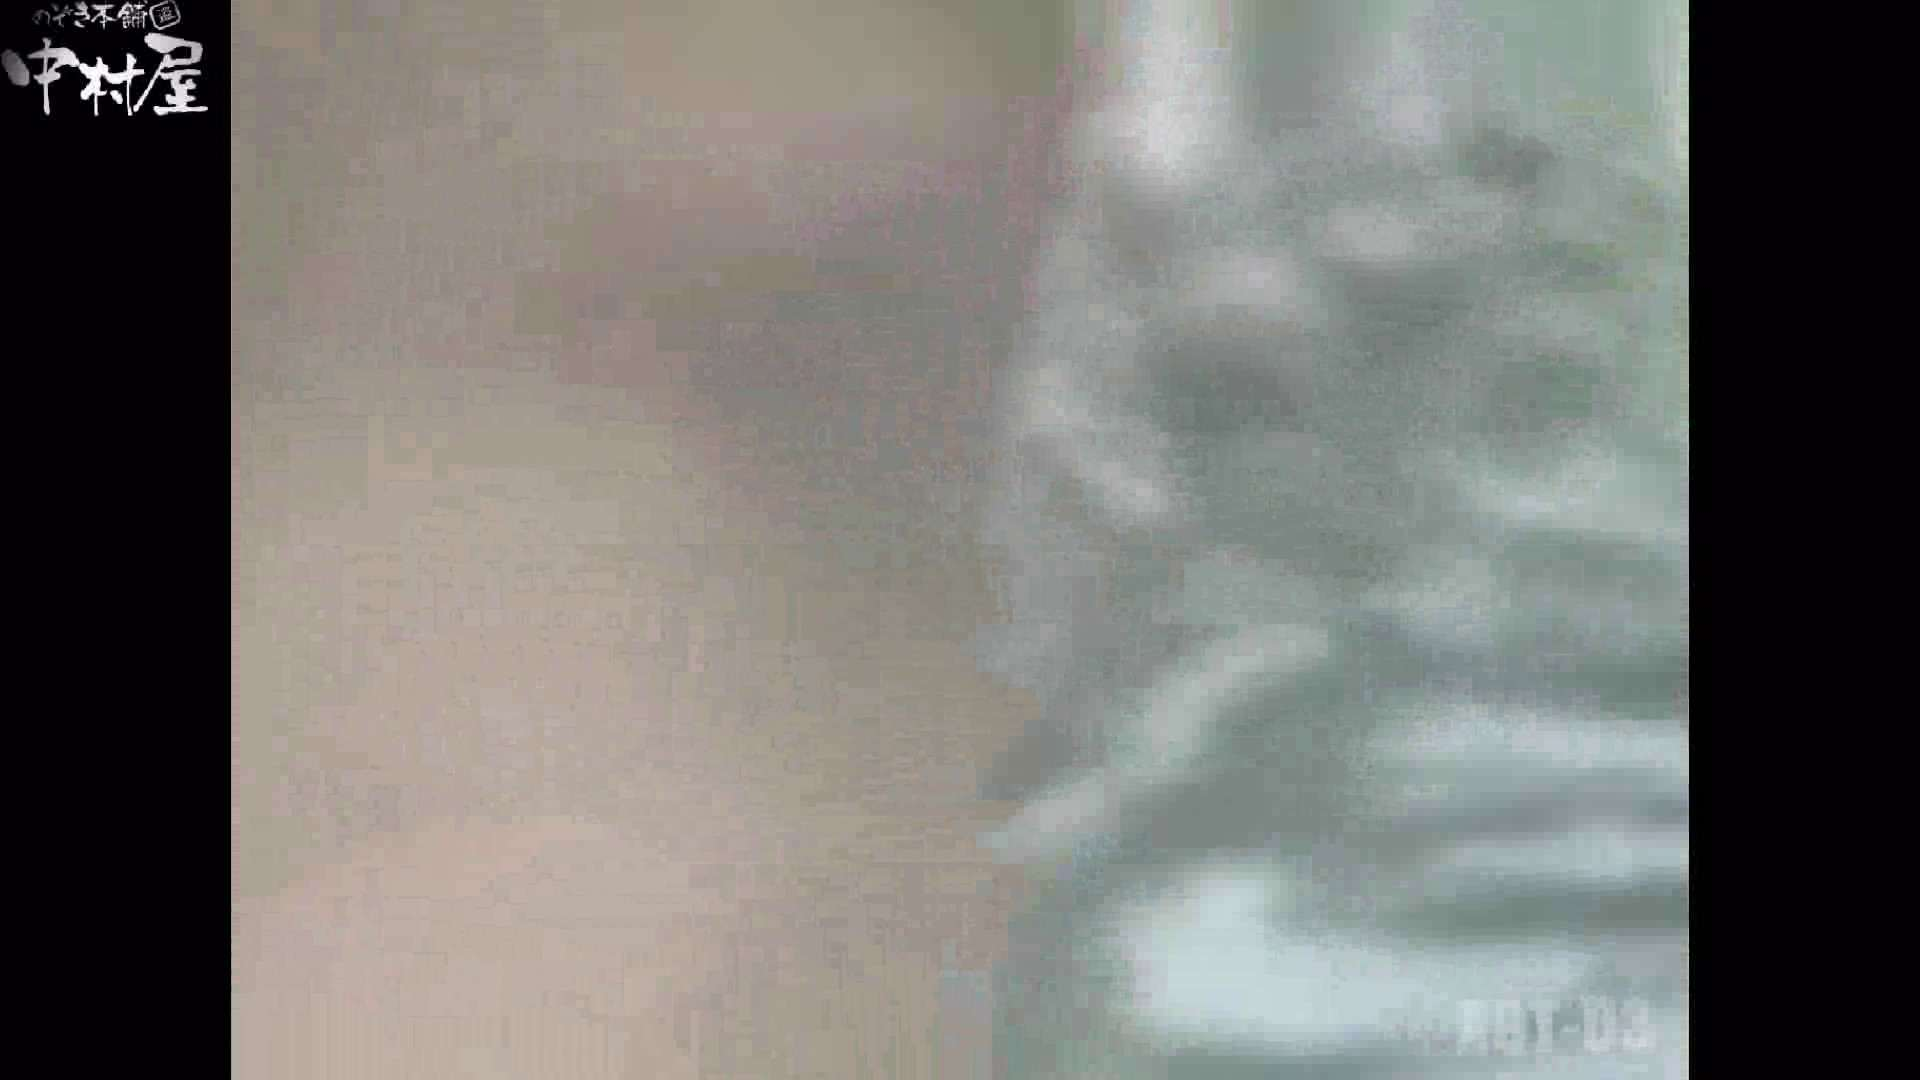 Aquaな露天風呂Vol.867潜入盗撮露天風呂参判湯 其の一 盗撮動画 盗み撮り動画 11枚 2